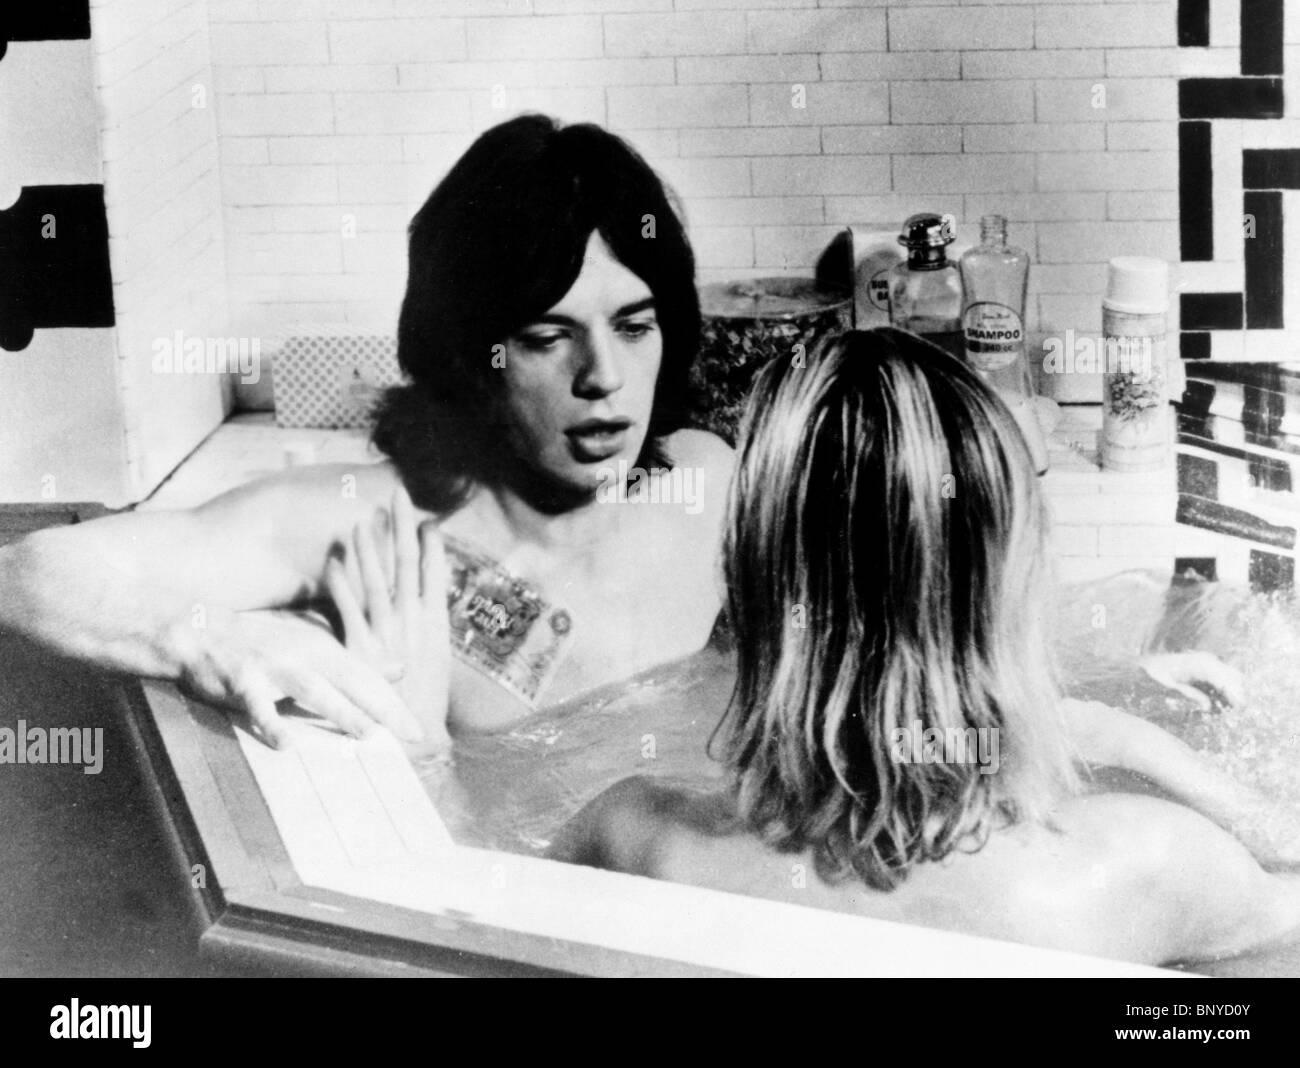 MICK JAGGER PERFORMANCE (1970) - Stock Image